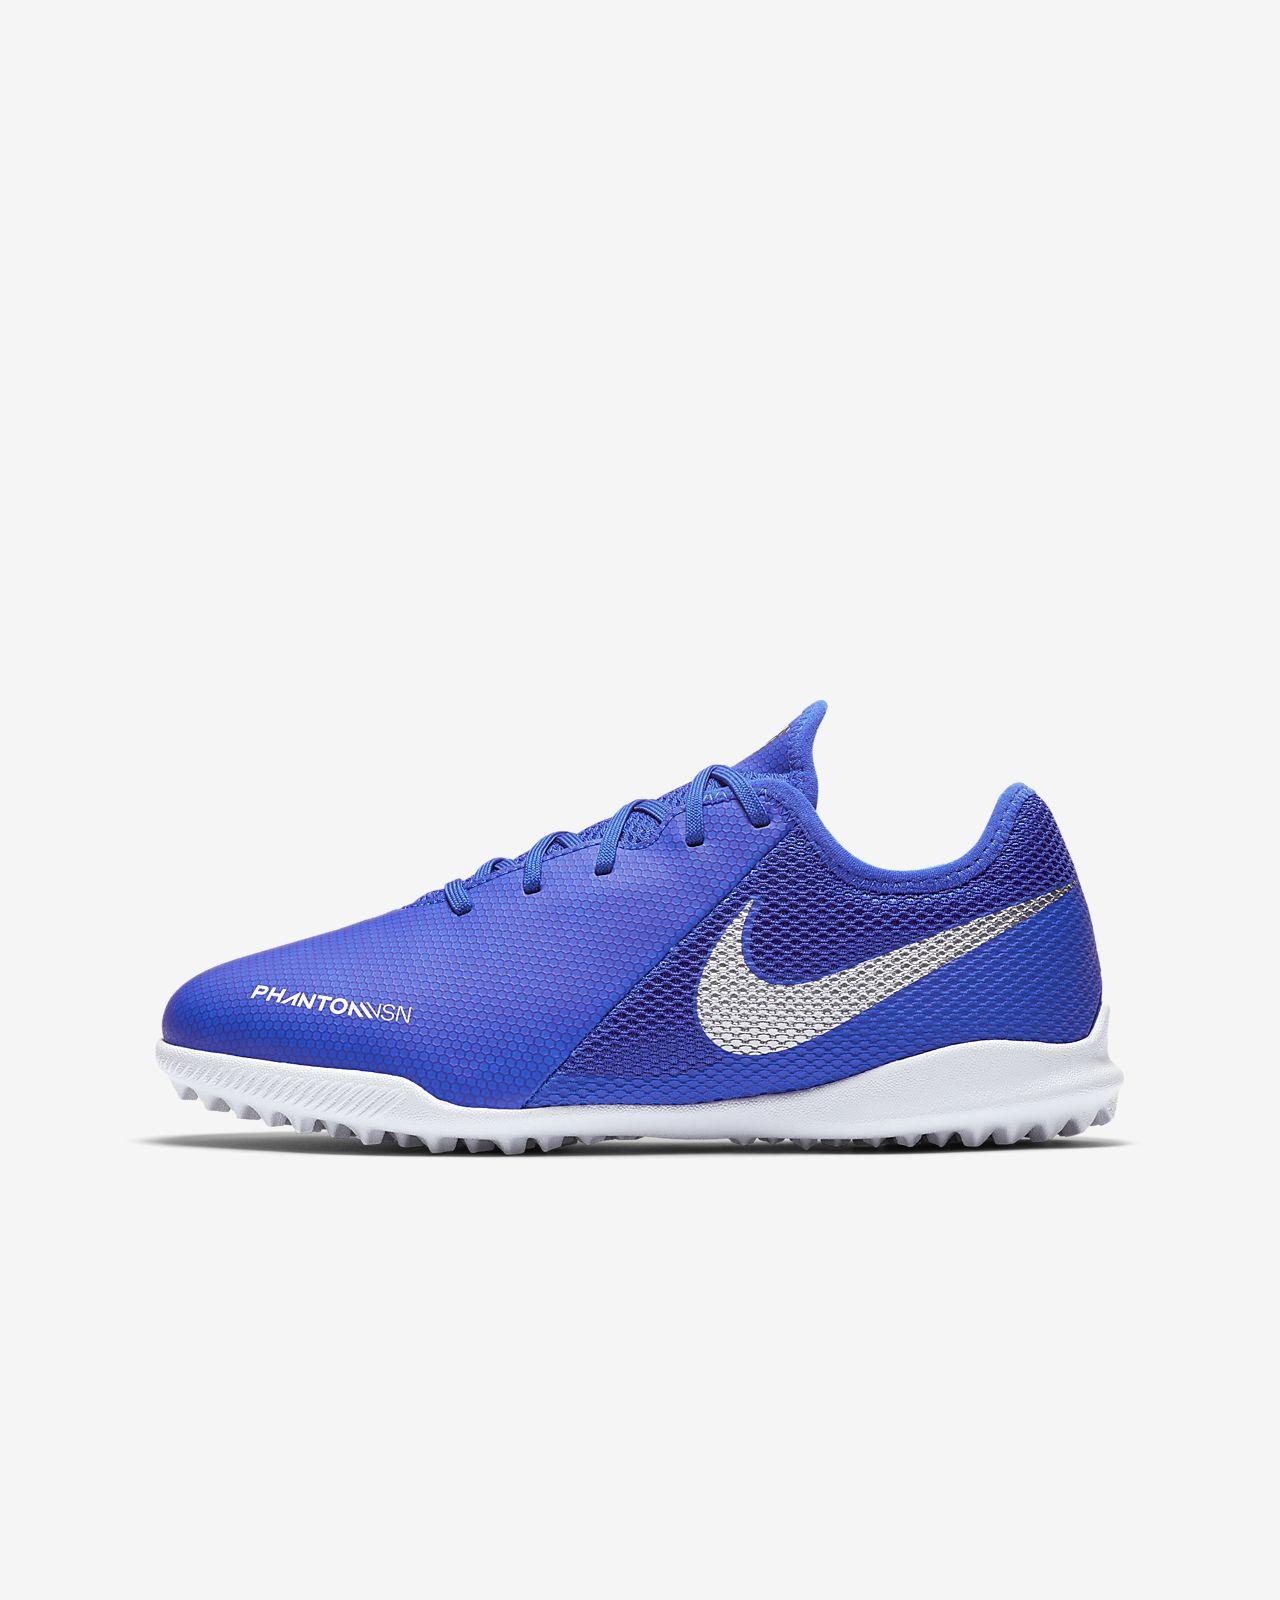 Nike Jr. Phantom Vision Academy TF Younger/Older Kids' Turf Football Shoe